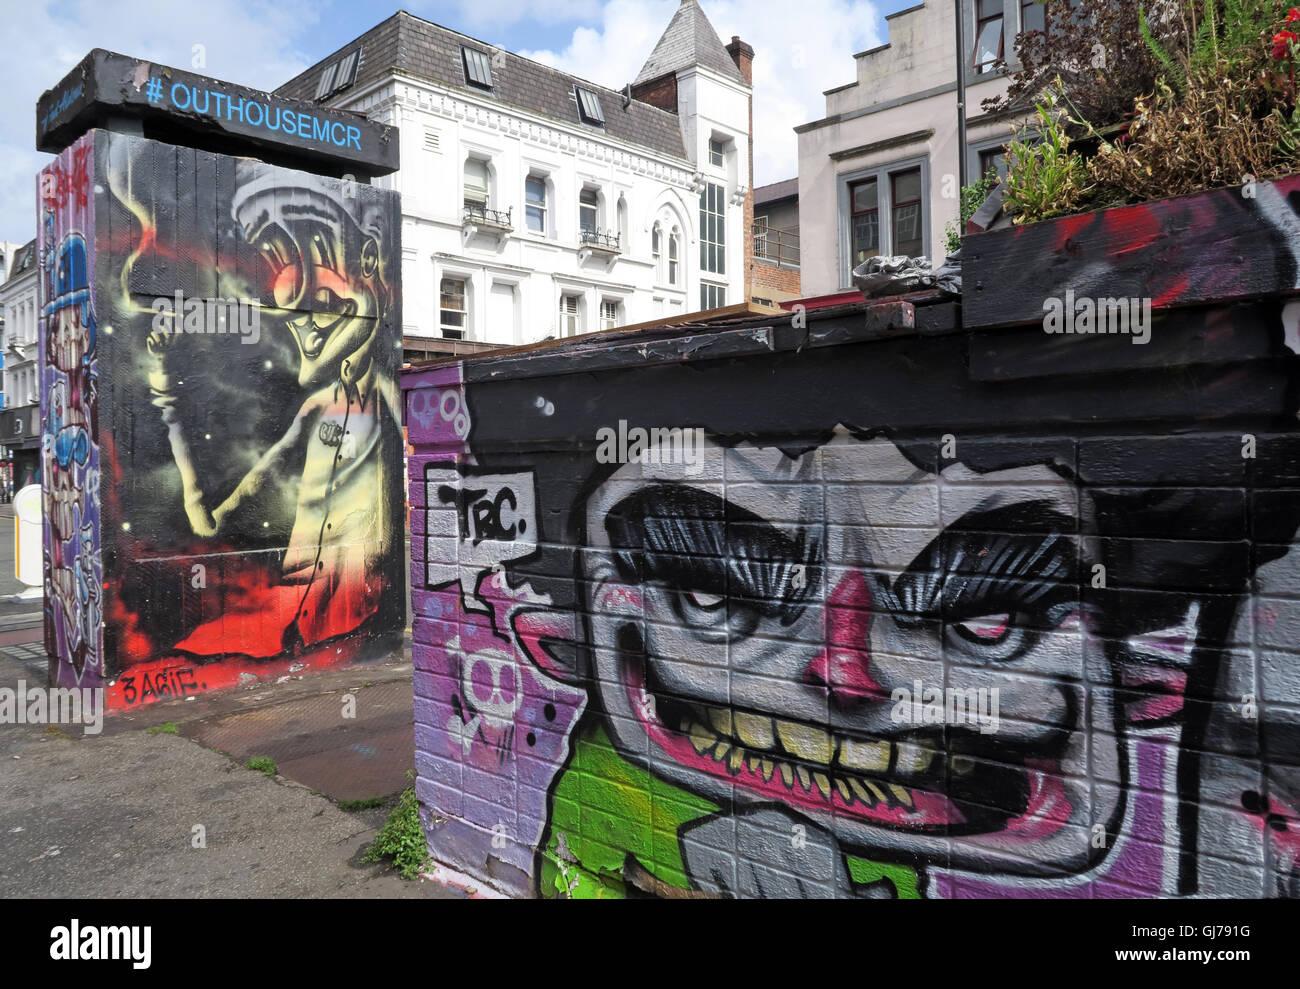 Laden Sie dieses Alamy Stockfoto Nördlichen Viertel Kunst in Stevenson Platz Manchester, UK - Wand Graffiti August2016 OUTHOUSEMCR - GJ791G